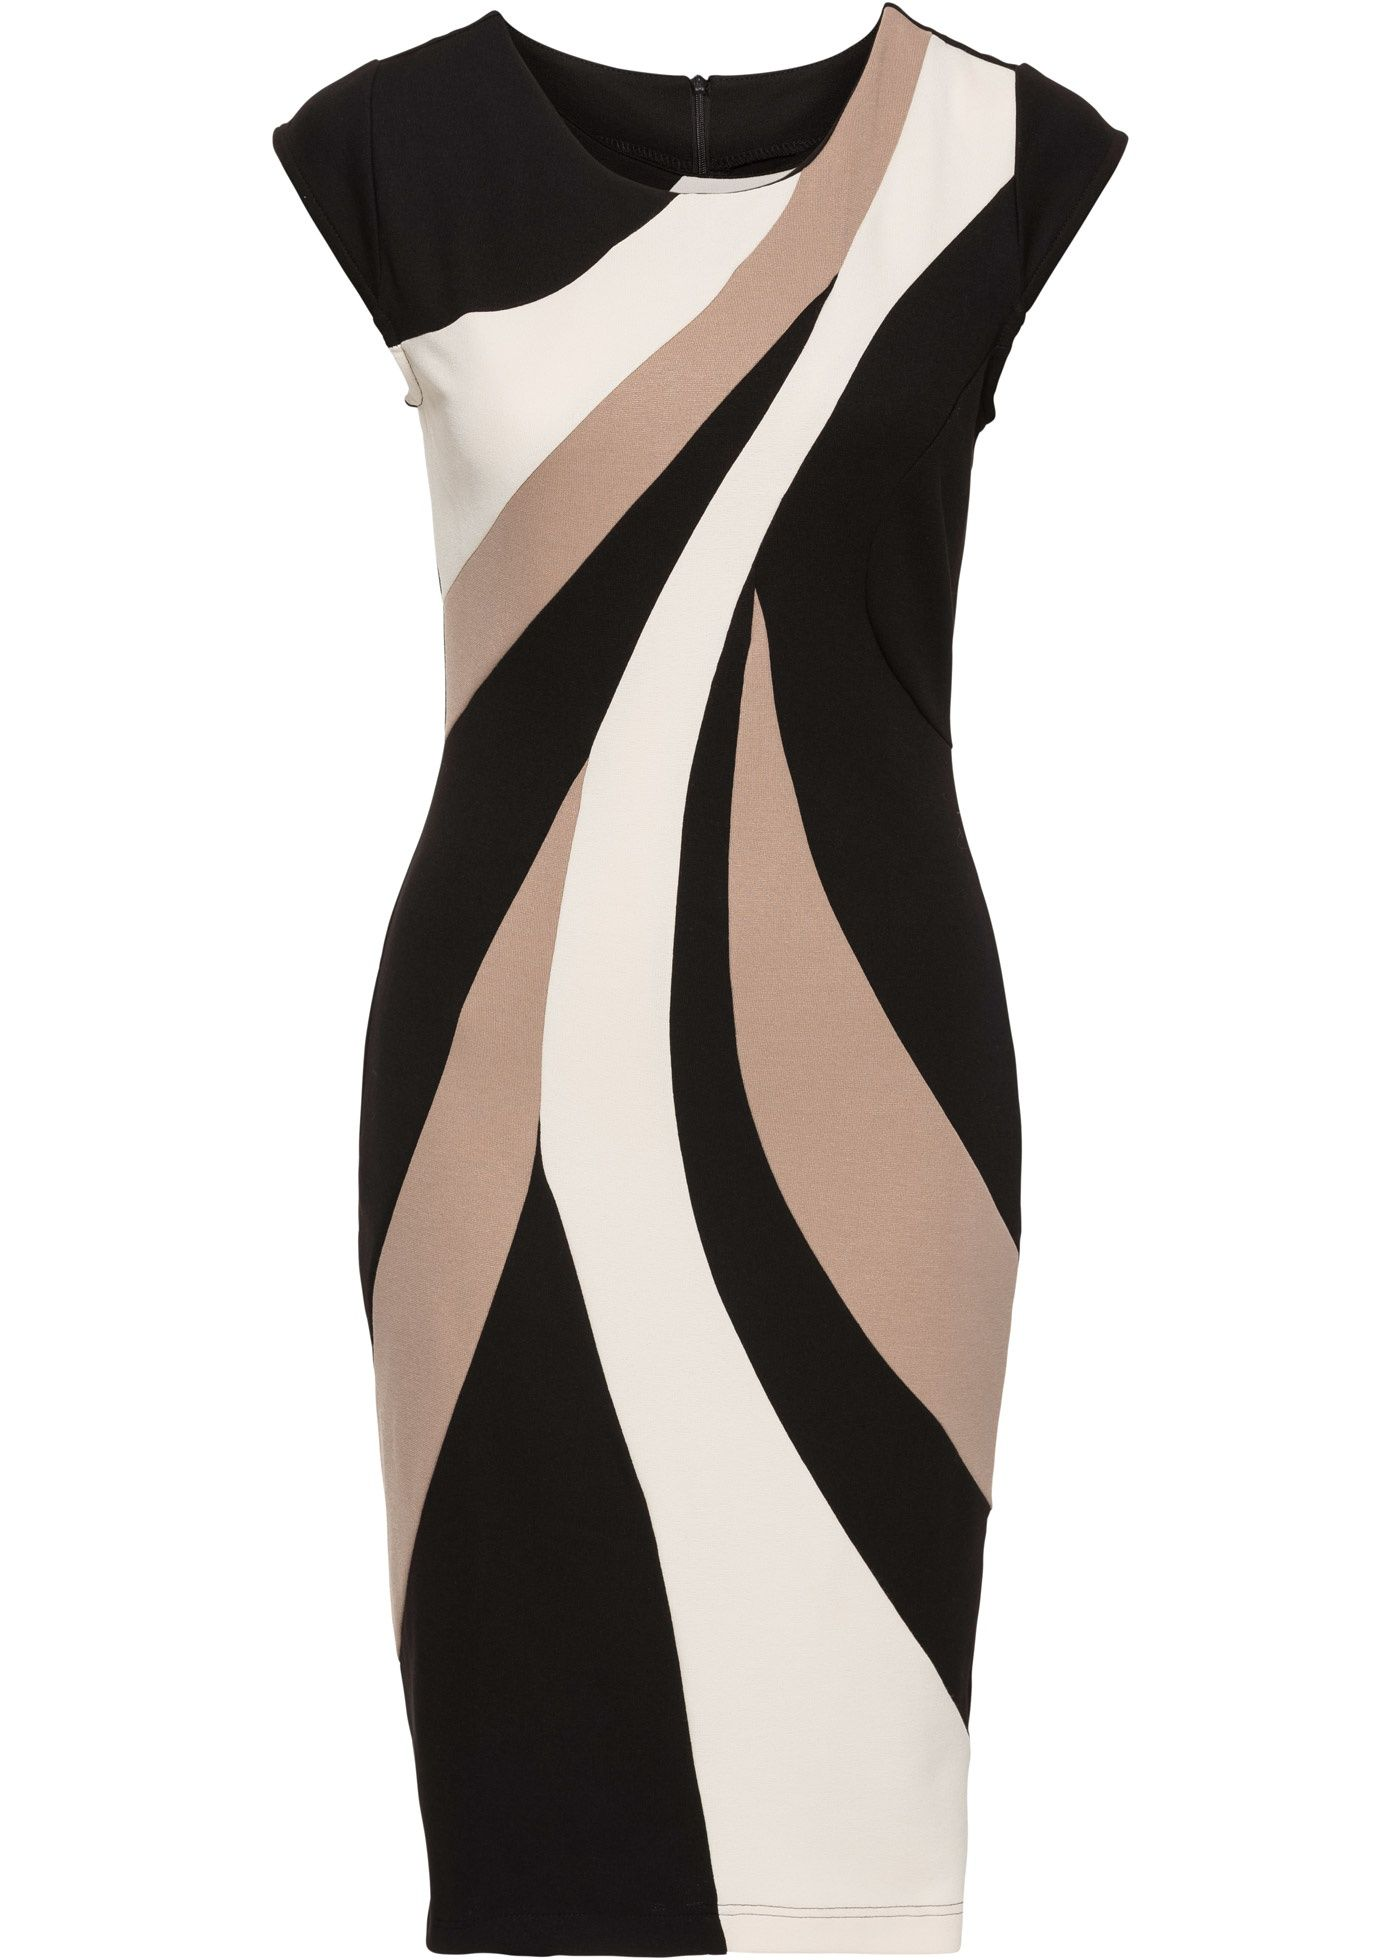 Kleid Multi Color beige - BODYFLIRT boutique jetzt im Online Shop